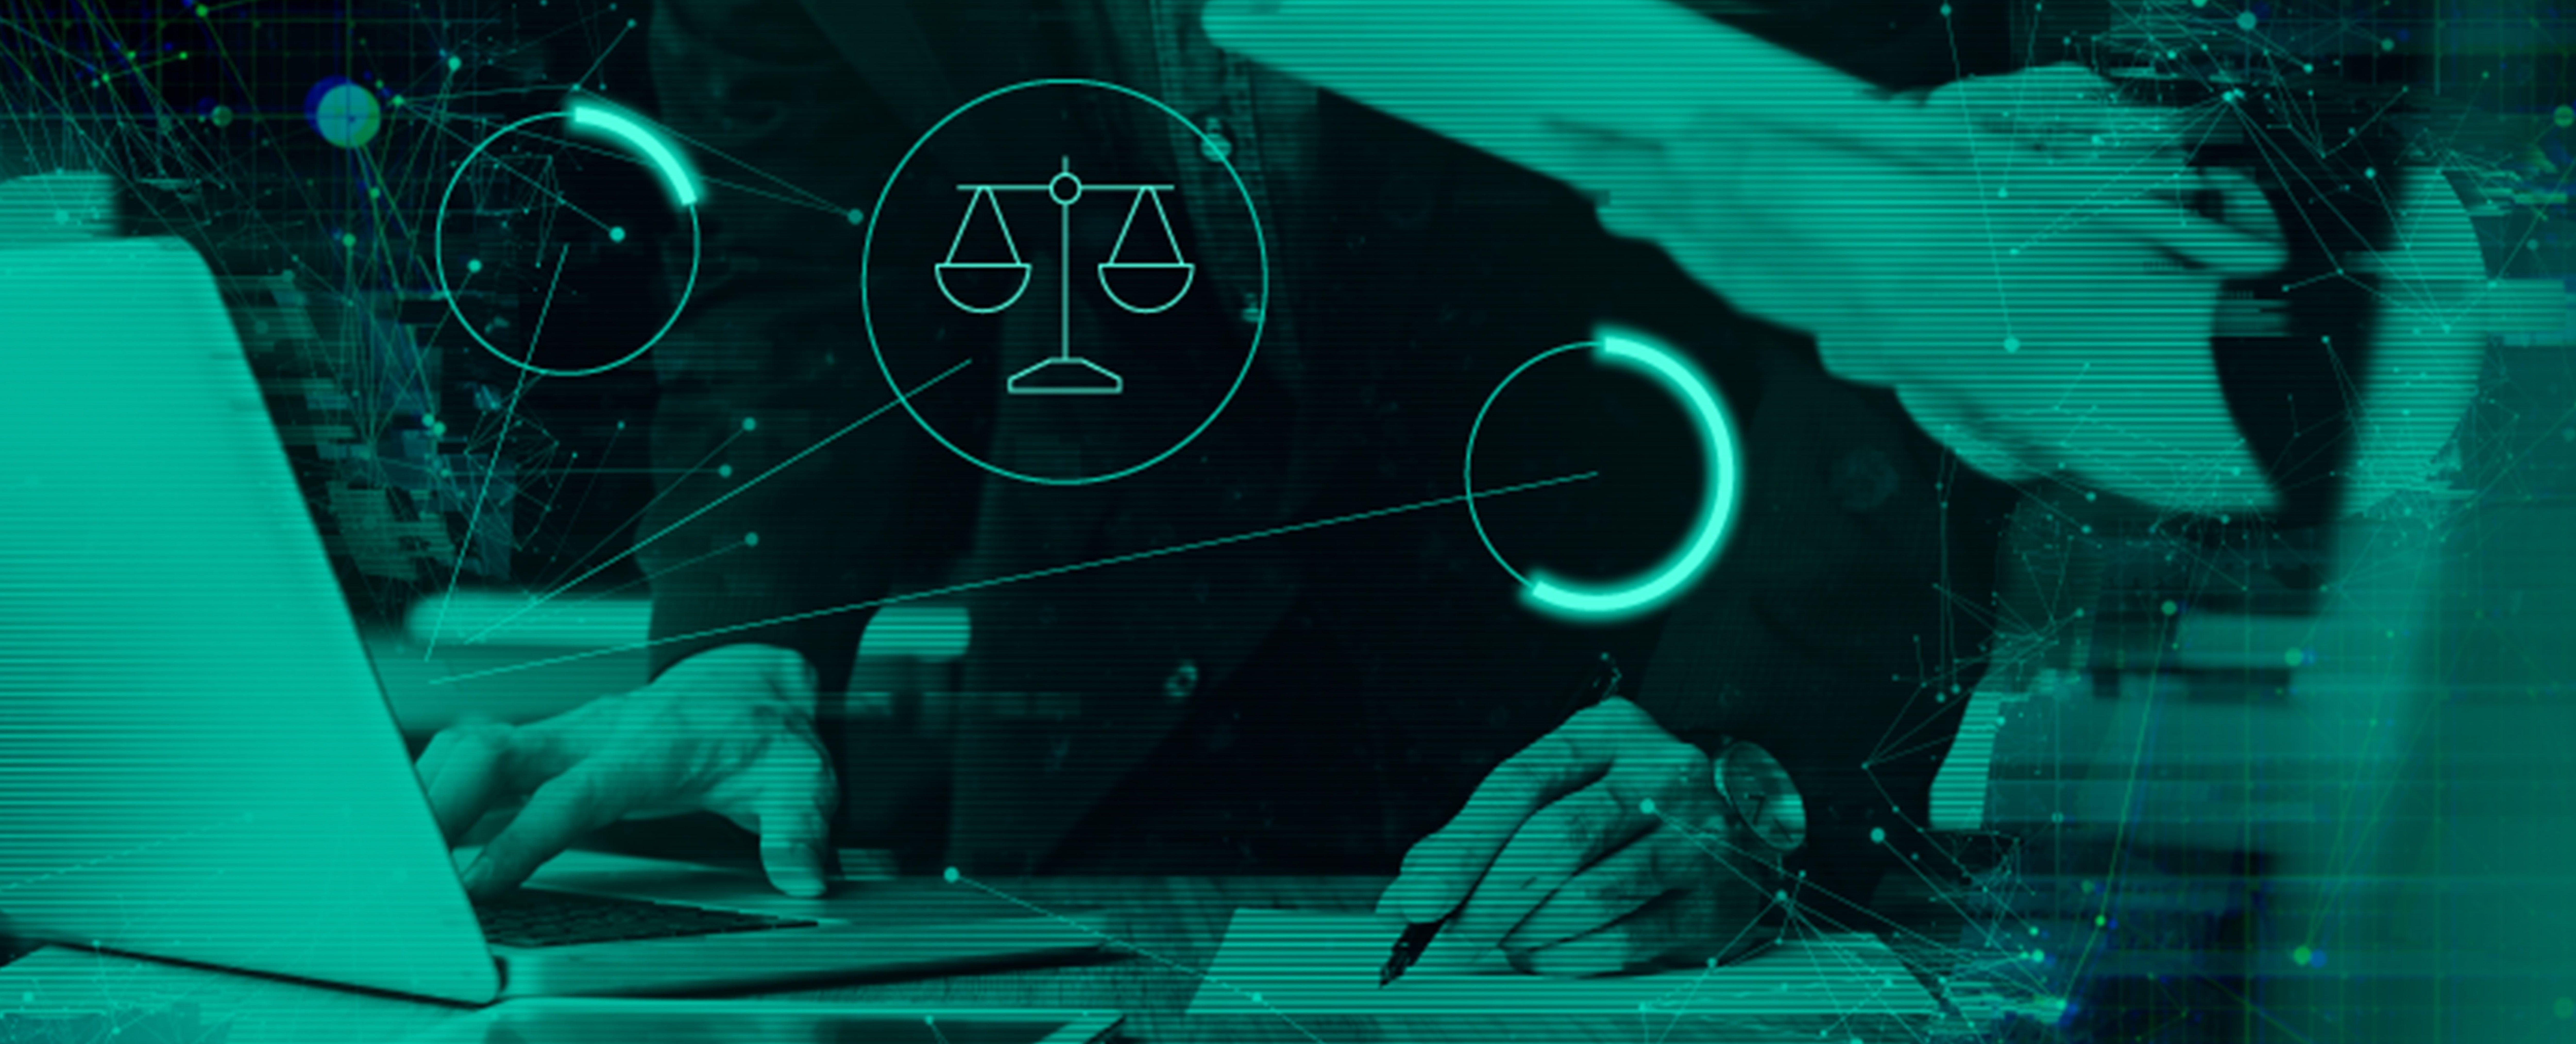 دادیاب؛ پیوند دهنده حقوق و فناوری